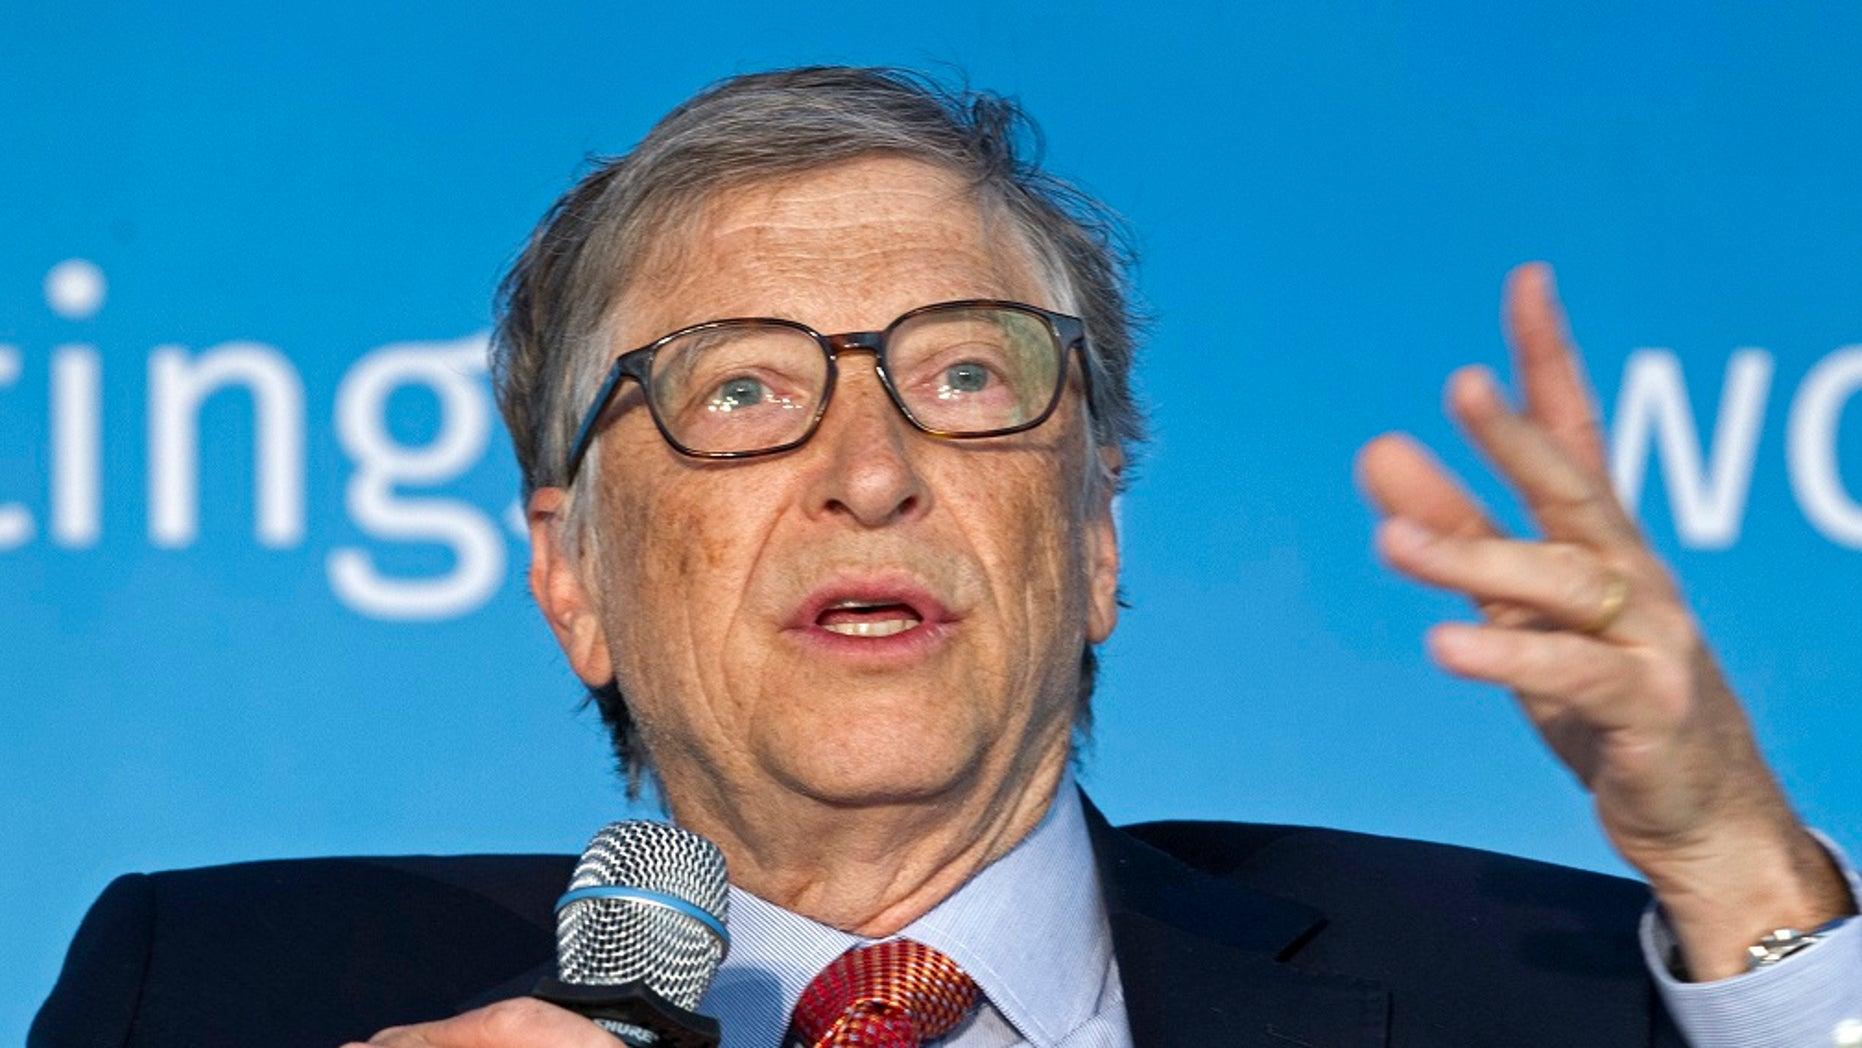 Bill Gates Slams Trump's Decision to Halt WHO funding: 'As Dangerous As It Sounds'